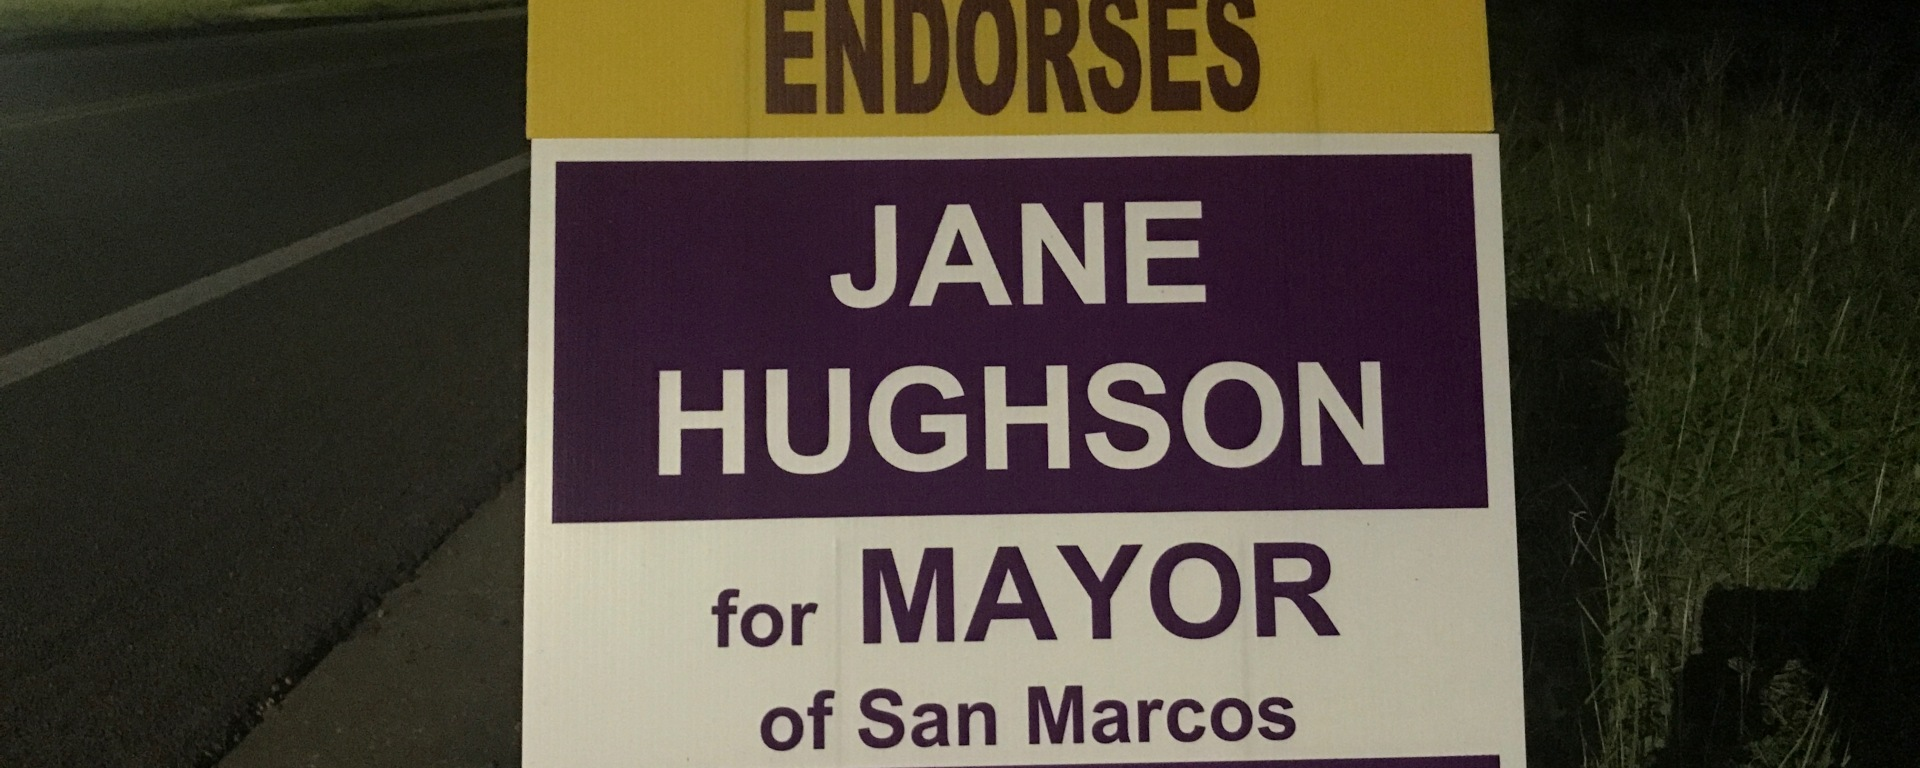 Campaign sign reading Jane Hughson for Mayor of San Marcos Description